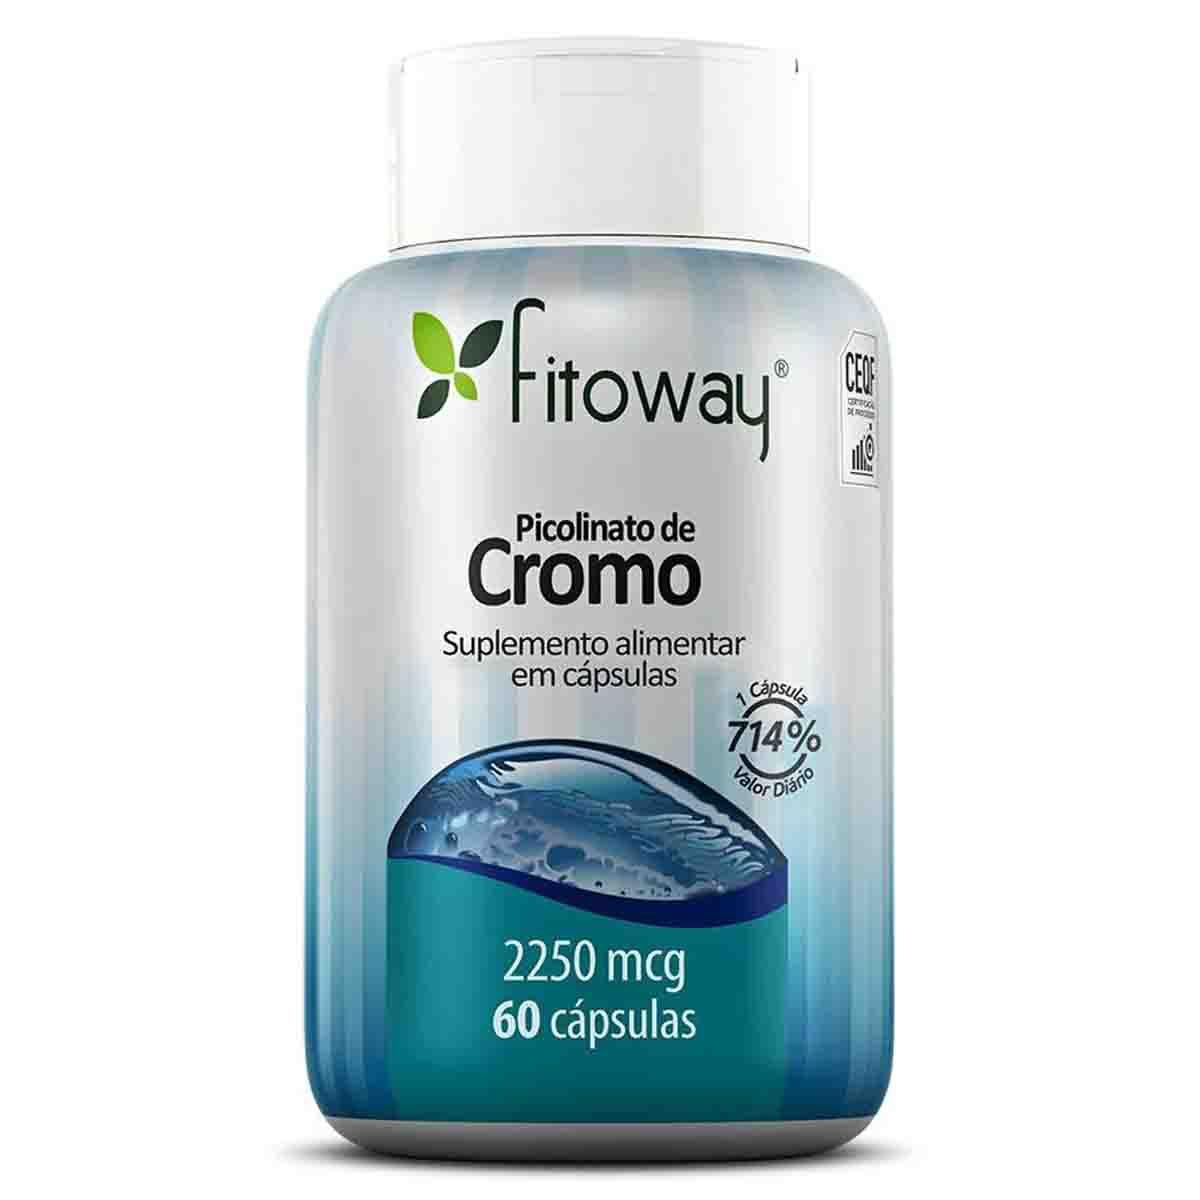 Picolinato de Cromo 2250mcg 60 cápsulas - Fitoway